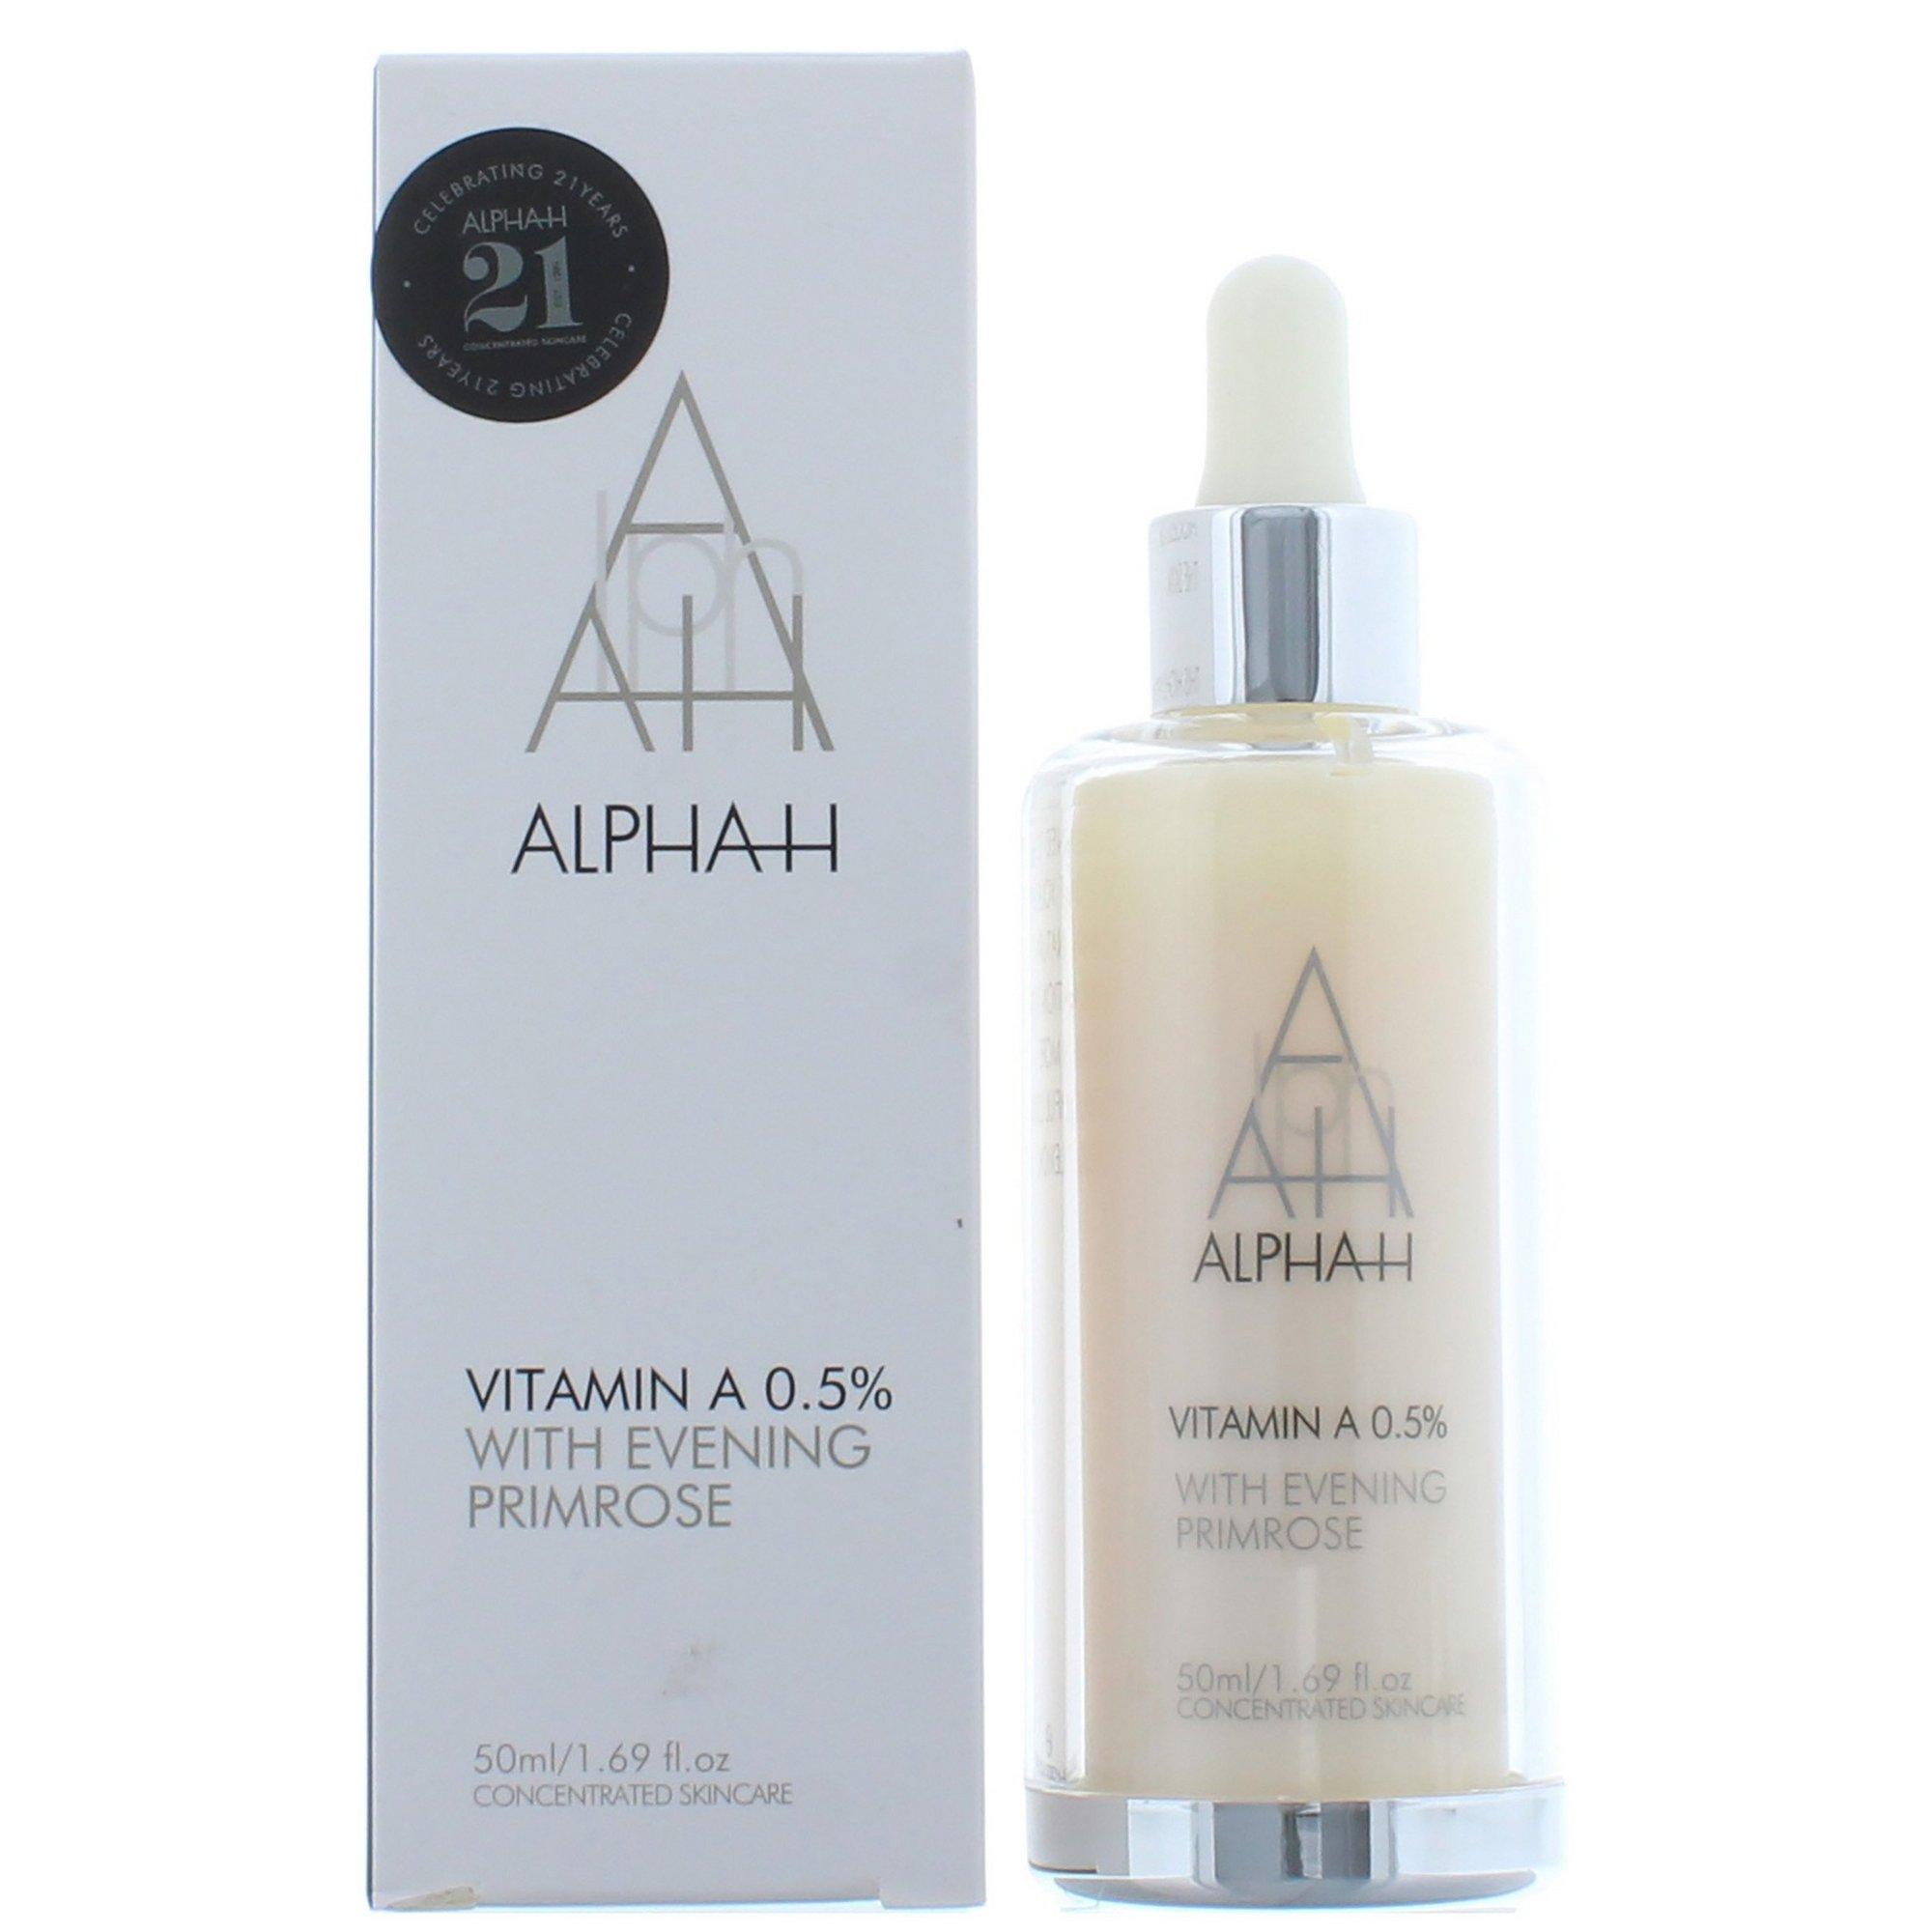 Image of Alpha H Vitamin A 0.5% Serum